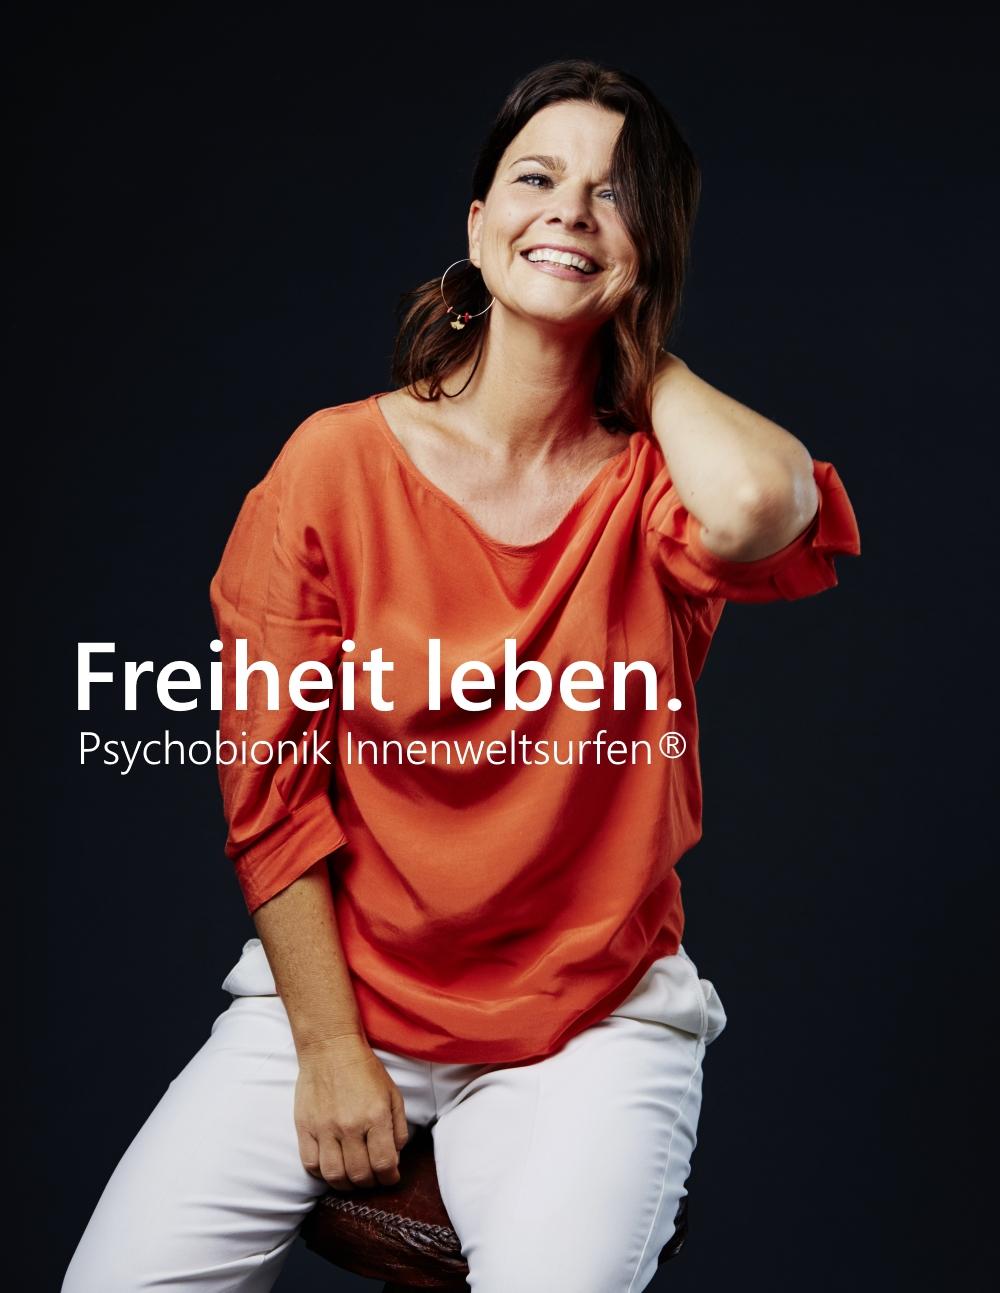 PSYCHOBIONIK® INNENWELTSURFEN